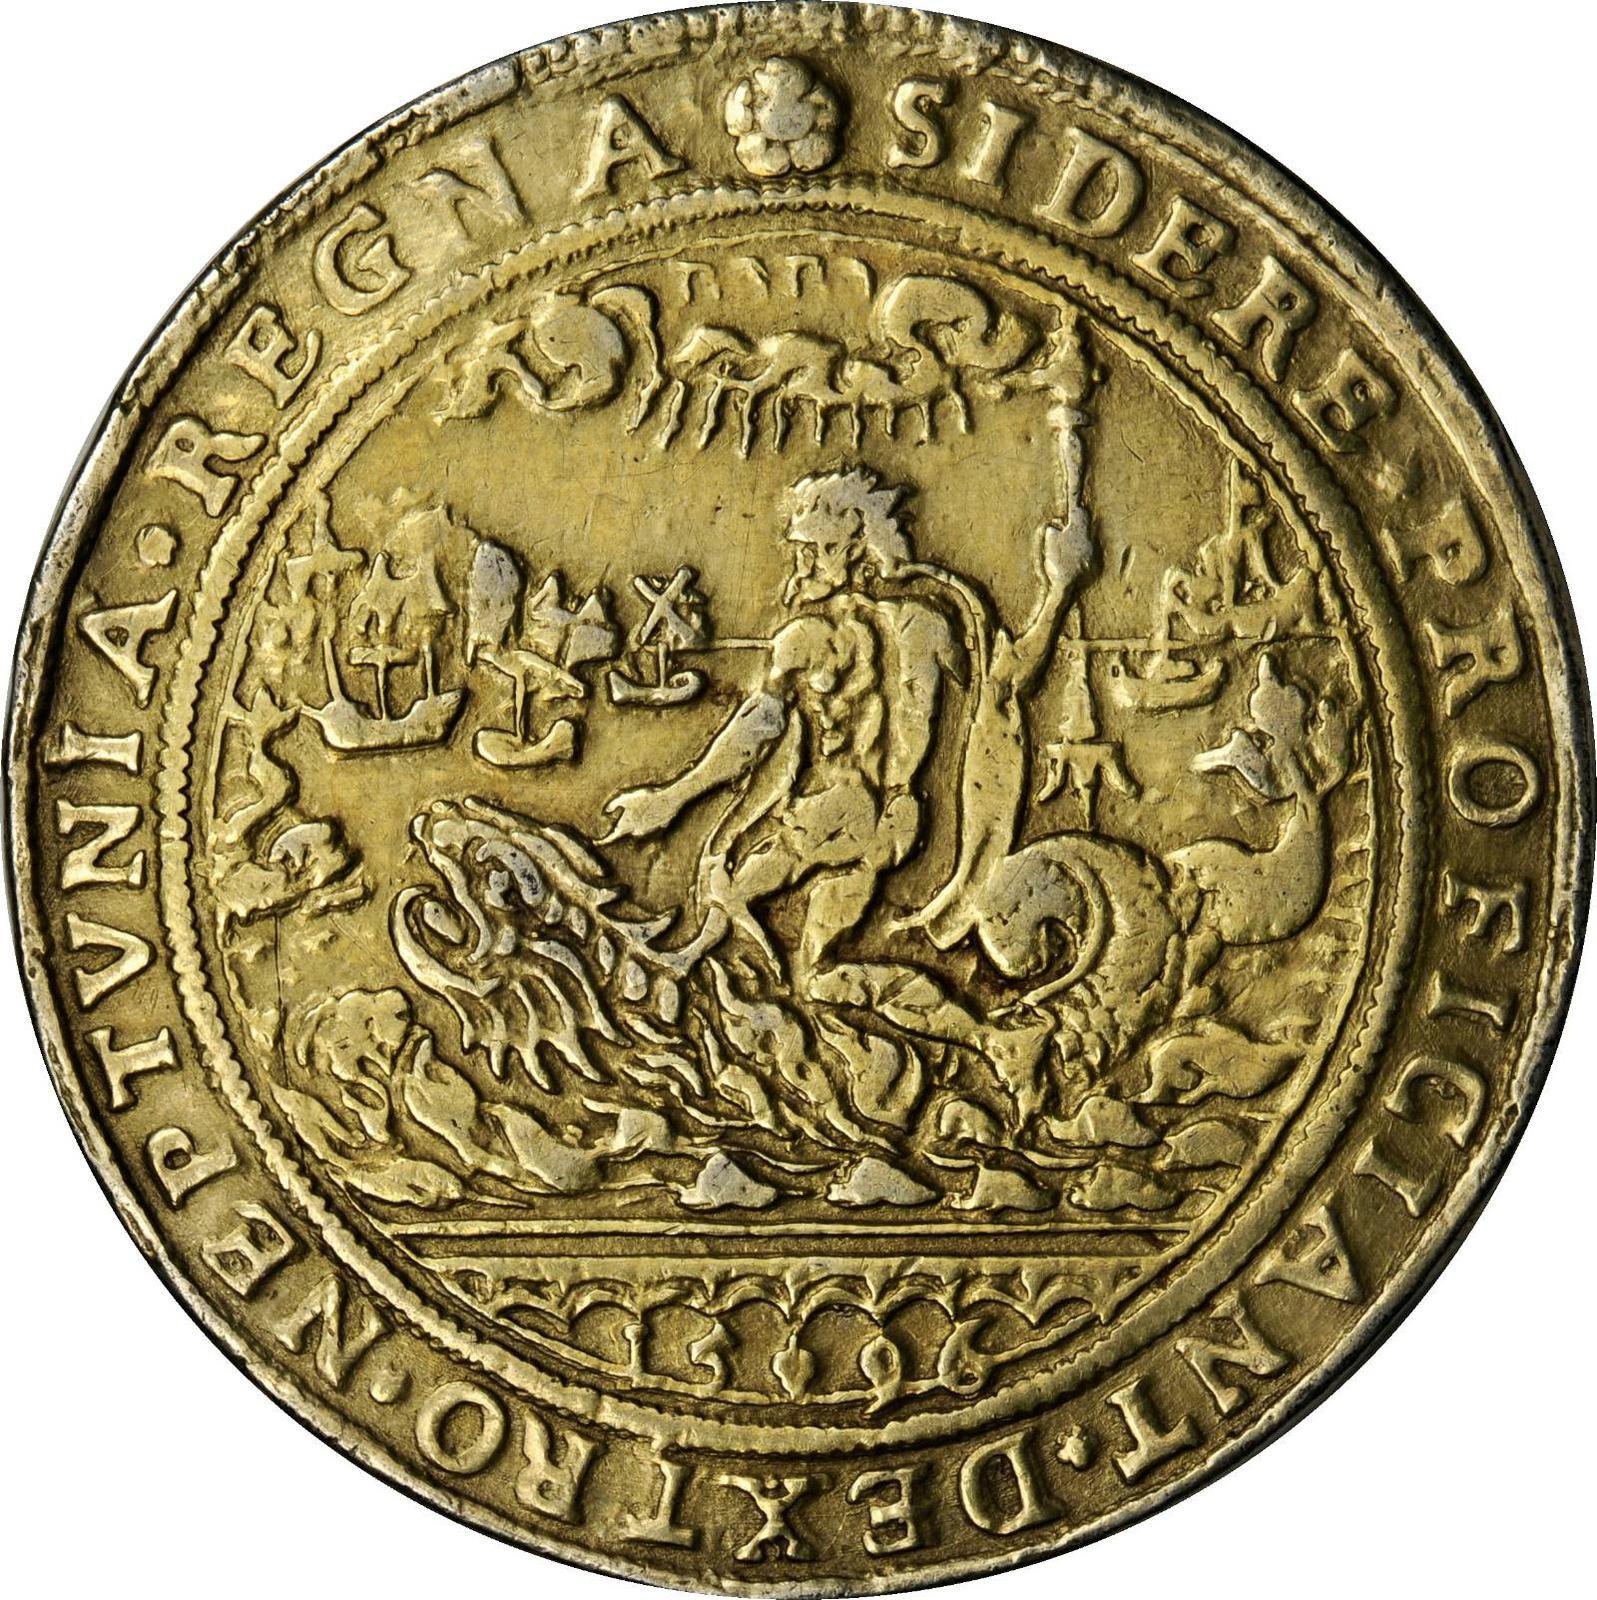 1596 Dutch Colonies Medal